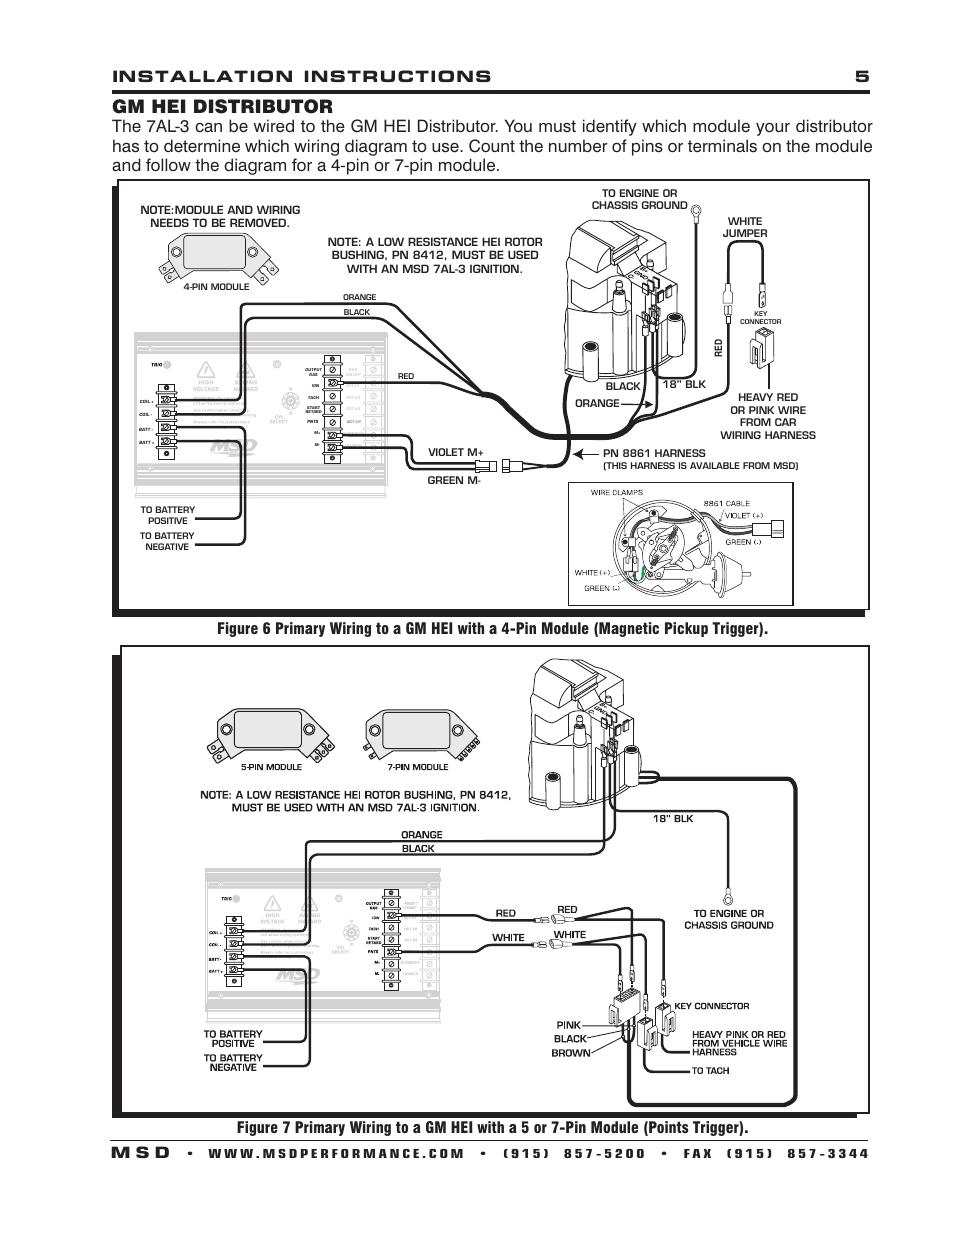 msd 7330 7al 3 ignition control installation page5?resize\\\\\\\\\\\\\\\\\\\\\\\\\\\\\\\=665%2C861 msd 7al wiring diagram & msd 7al 2 wiring diagram facbooik com msd ews 3 wiring diagram at webbmarketing.co